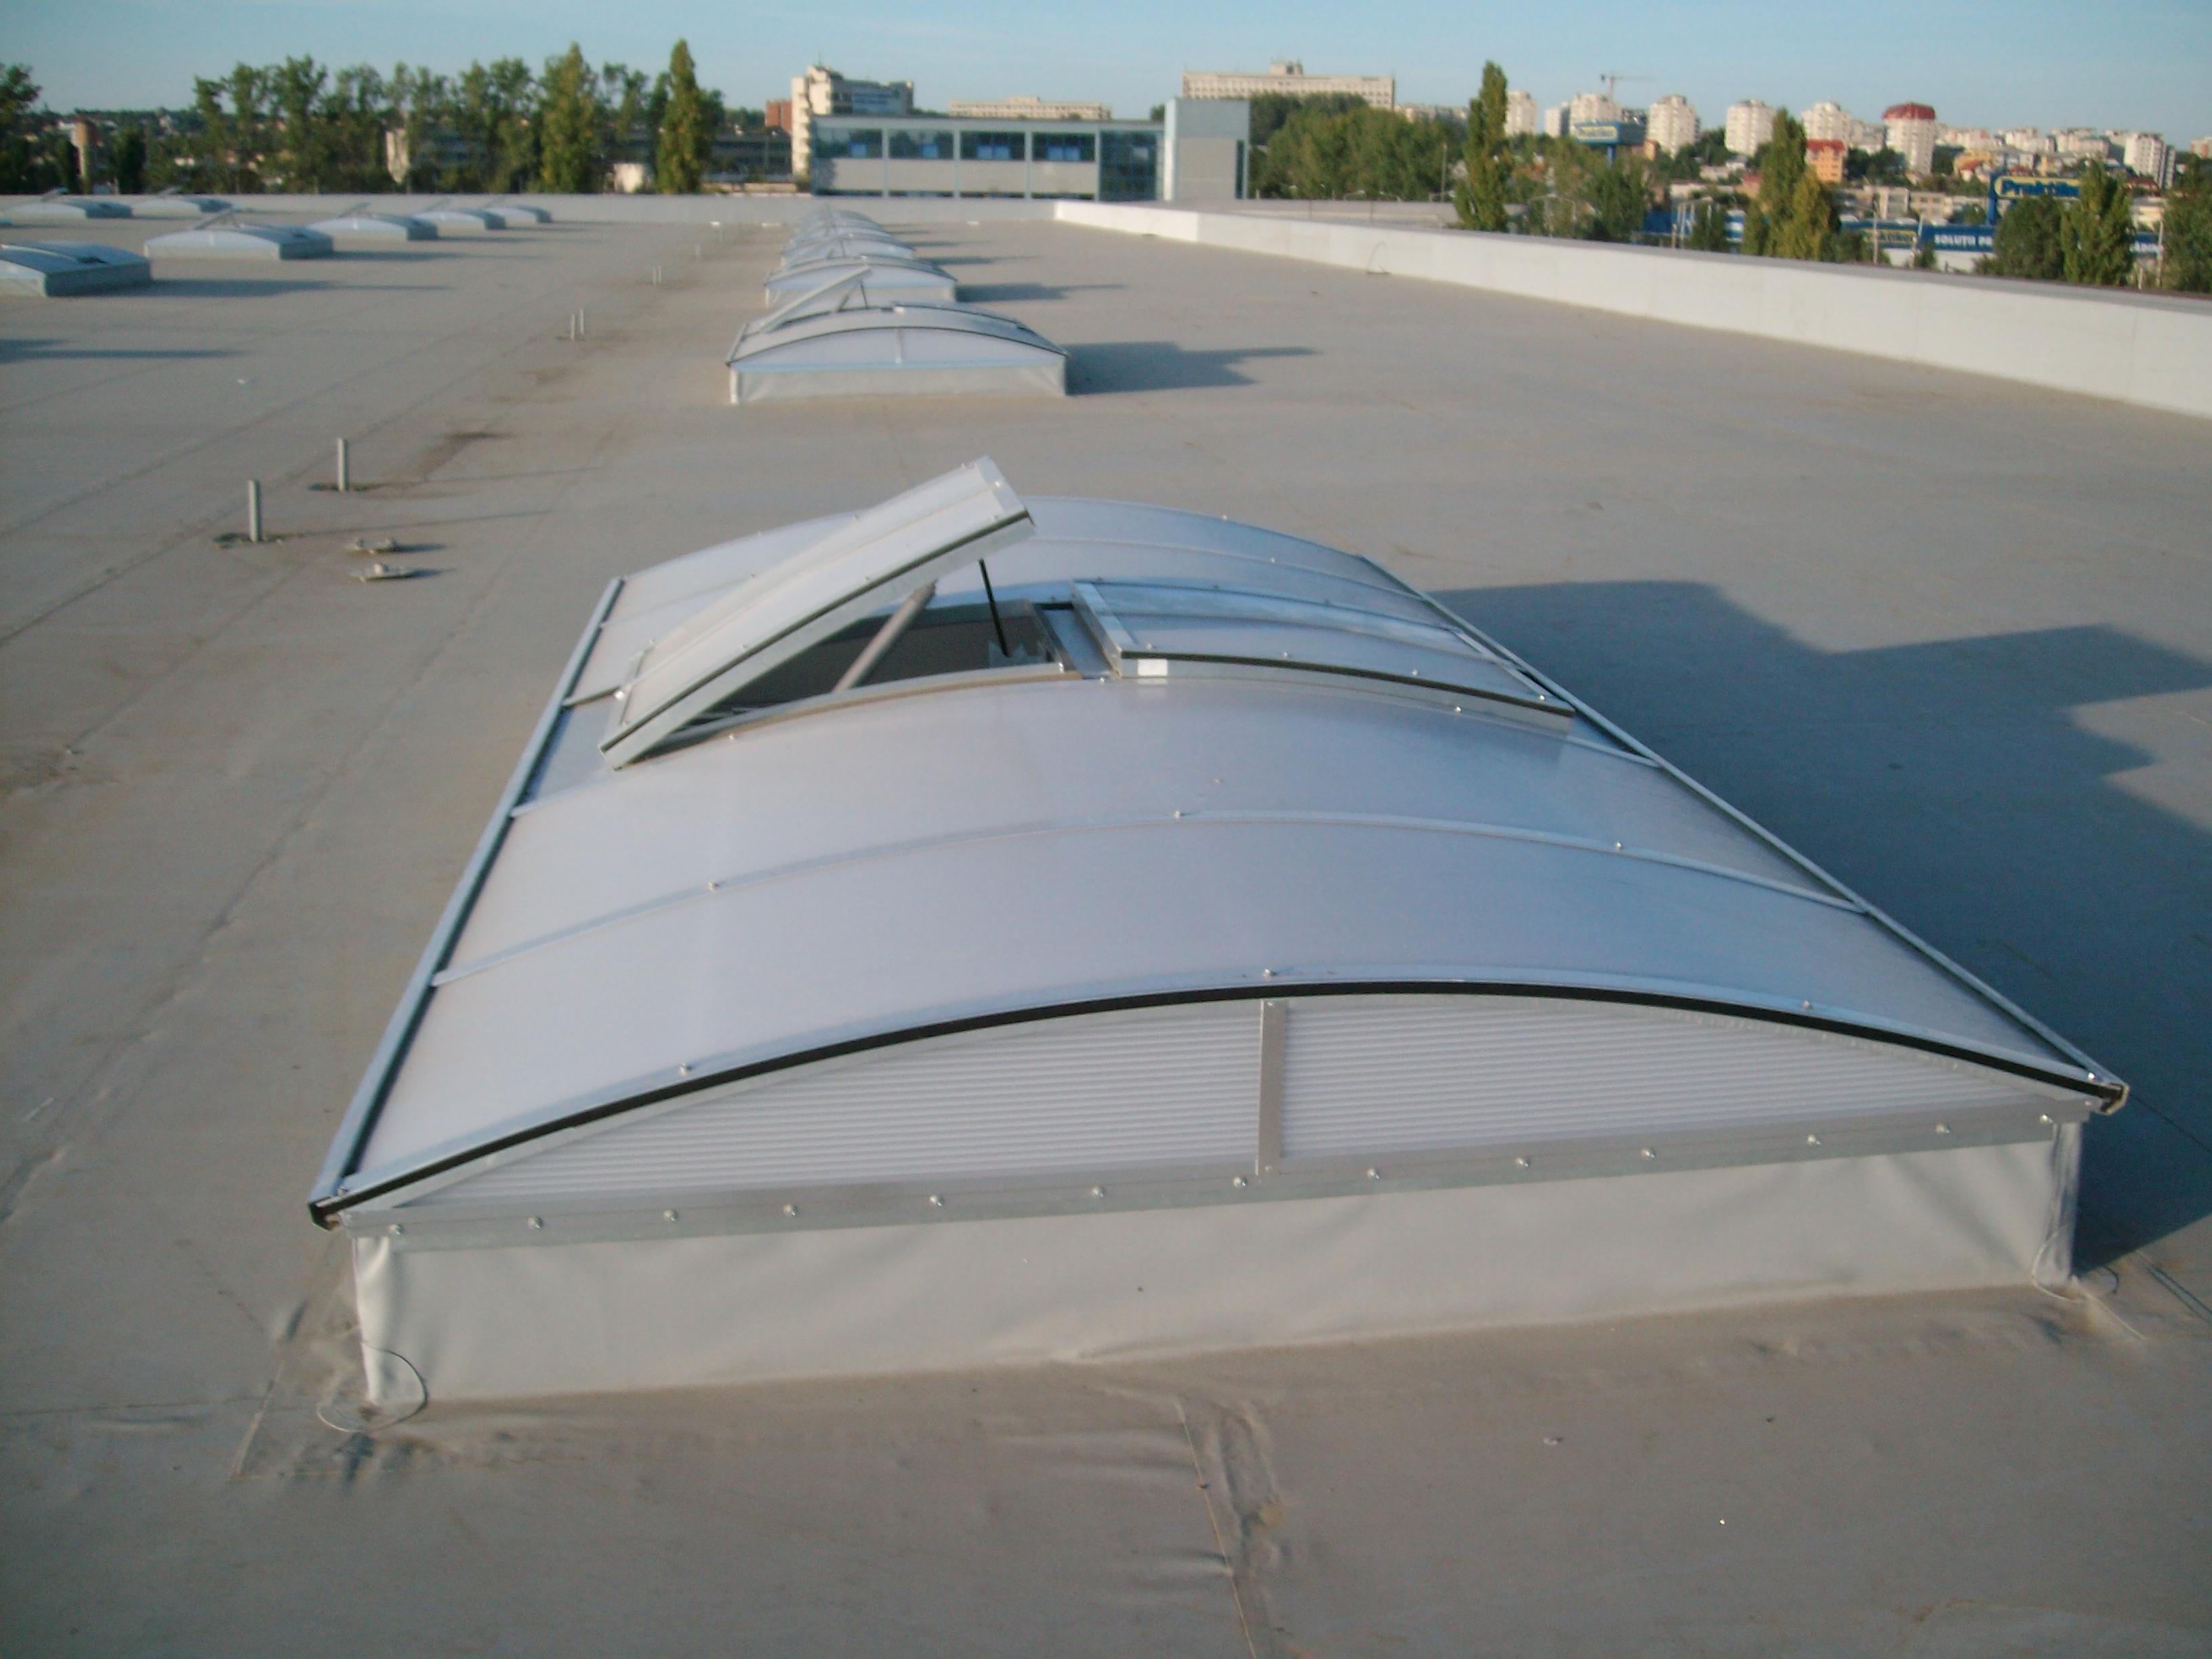 Luminatoare industriale - Spatiu comercial Baumax - Iasi HEXADOME - Poza 4